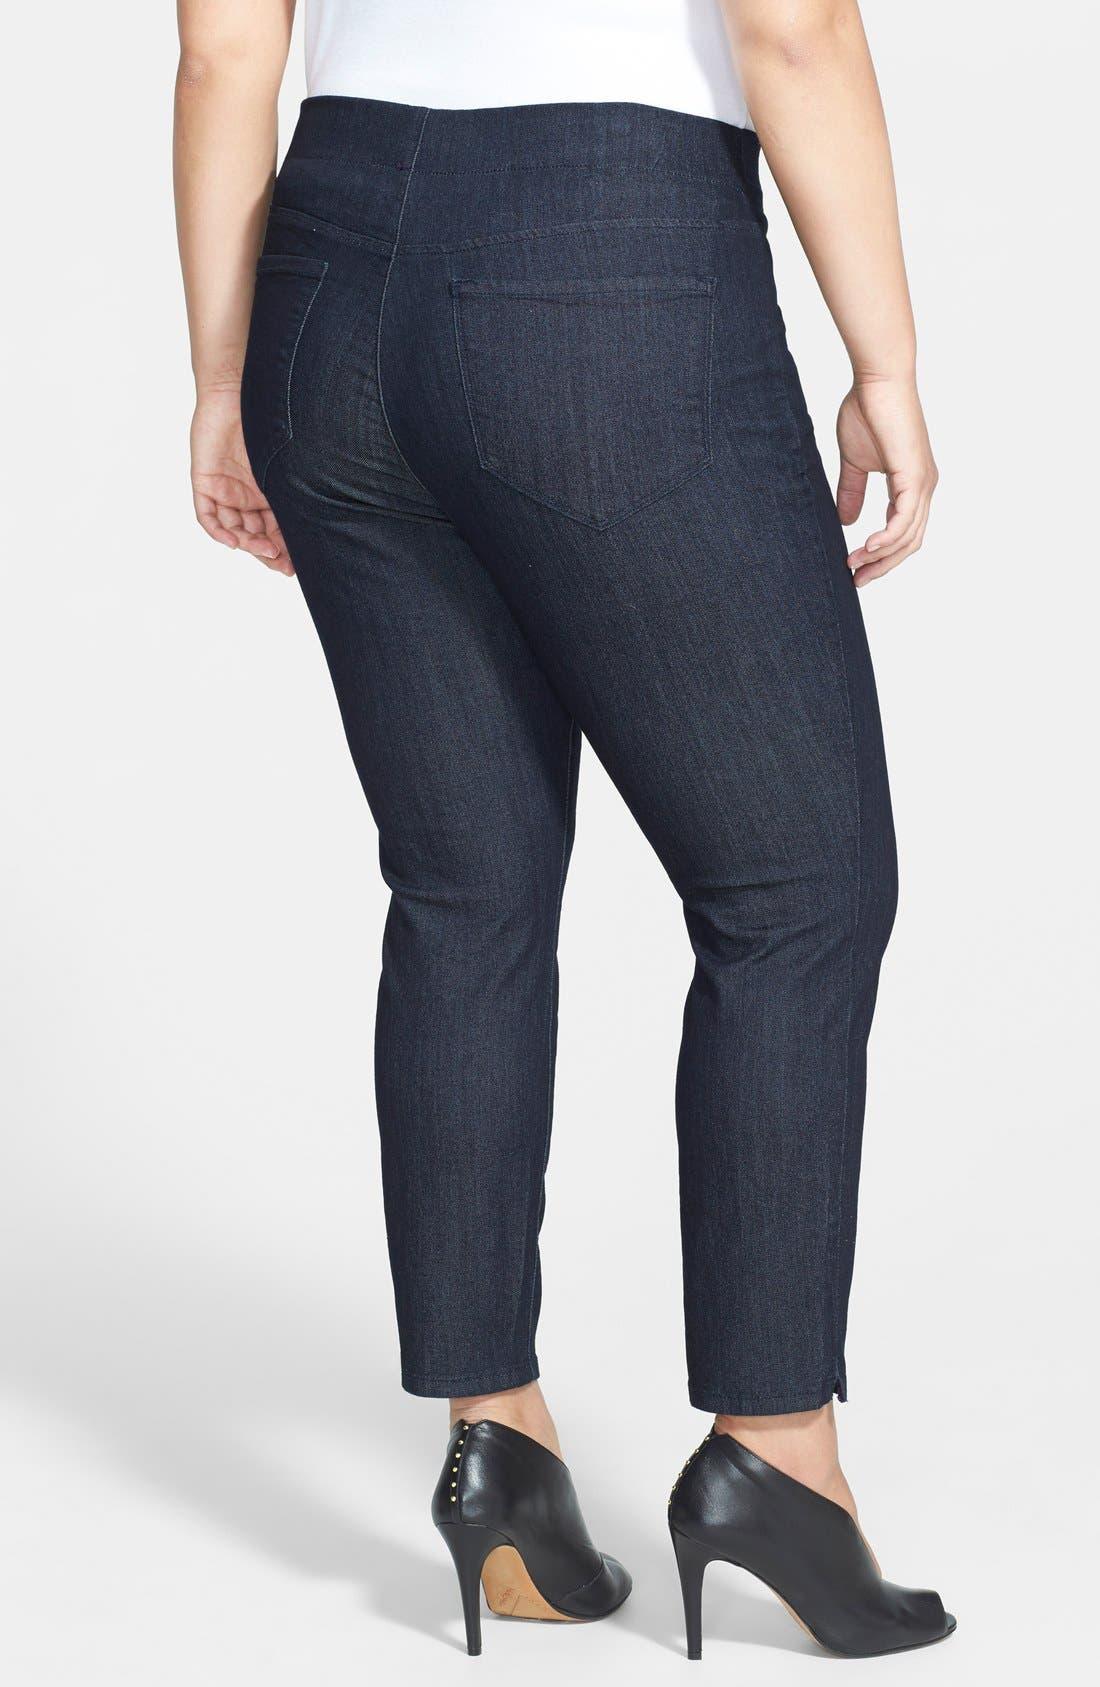 Alternate Image 2  - NYDJ 'Millie' Stretch Ankle Jeans (Dark Enzyme) (Plus Size)